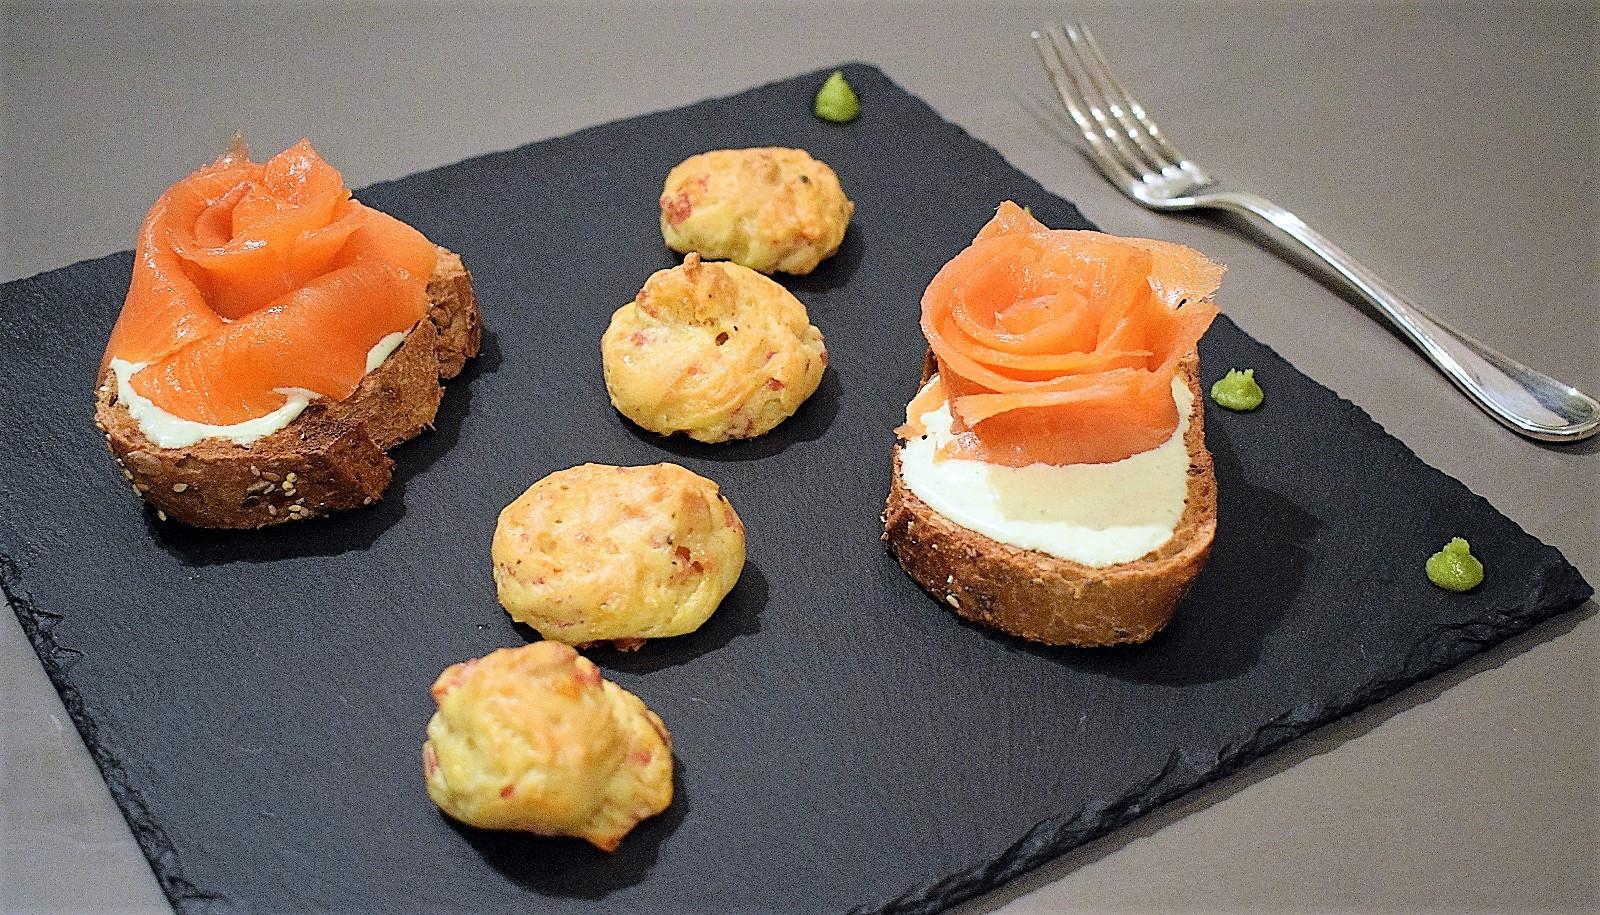 Diner Gastronomique 4.jpg